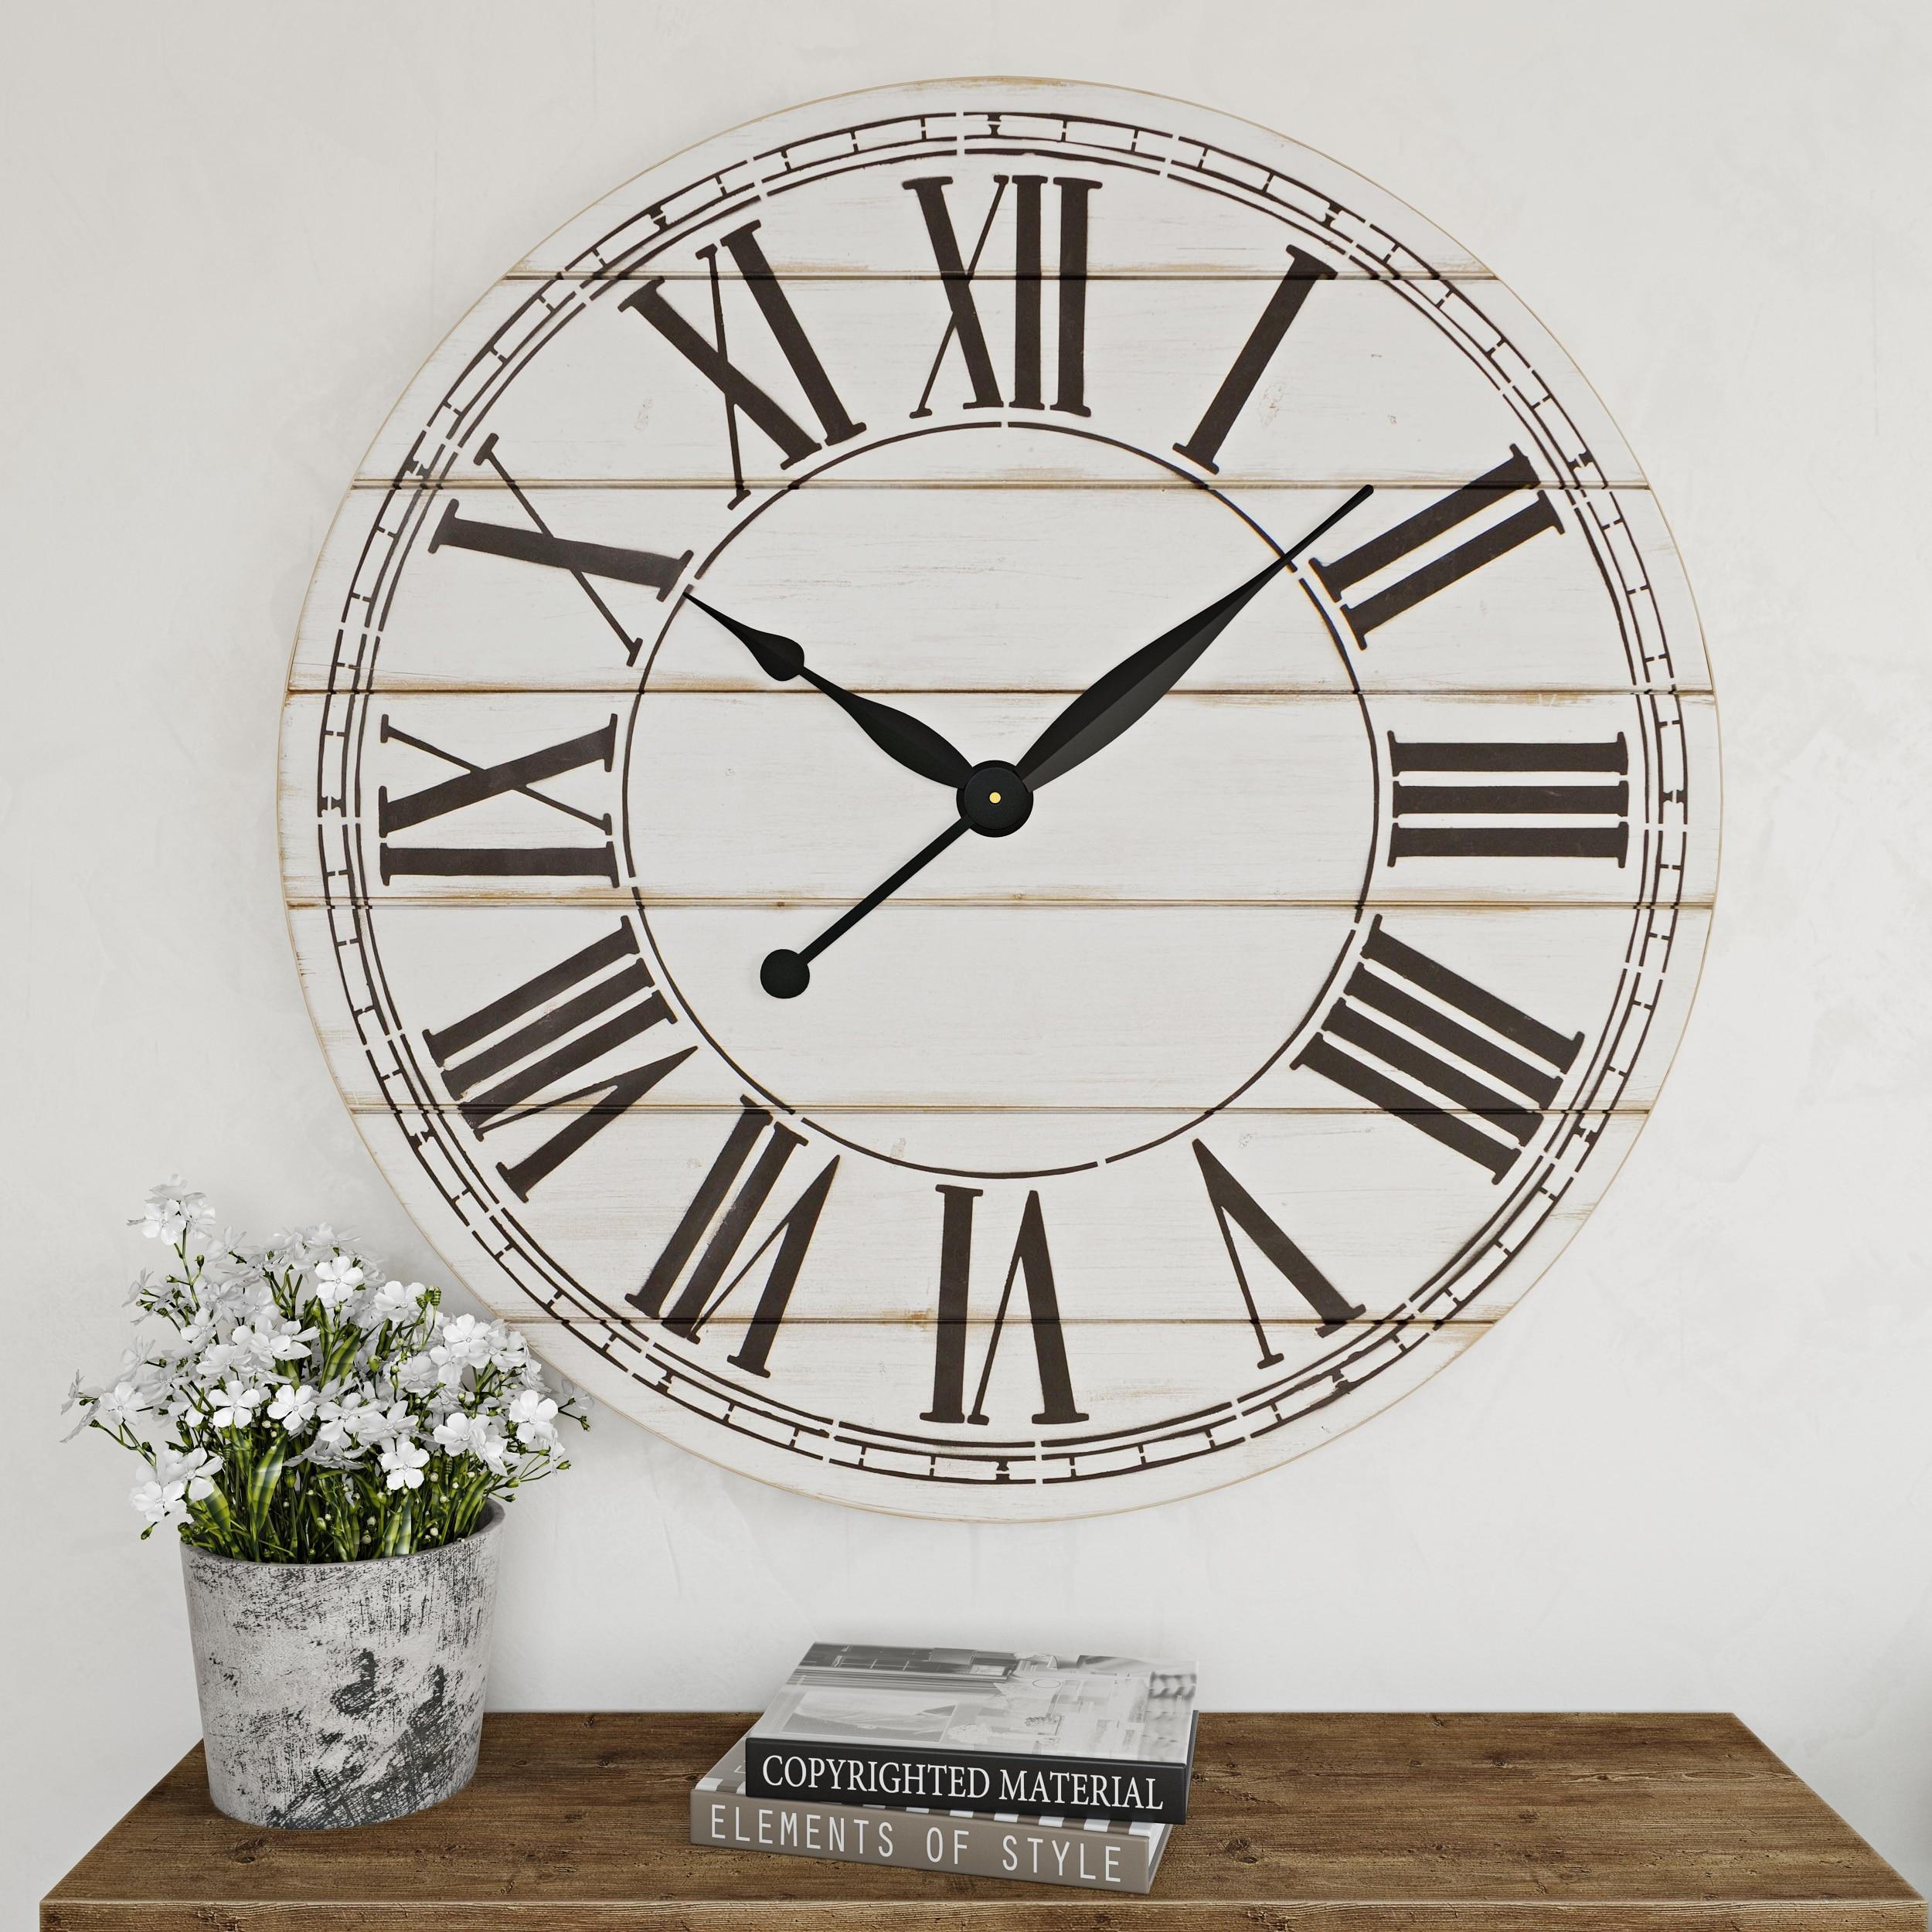 Shop The Gray Barn Oversize Shiplap Wall Clock 48 H X 48 W X 1 5 D Overstock 29045987